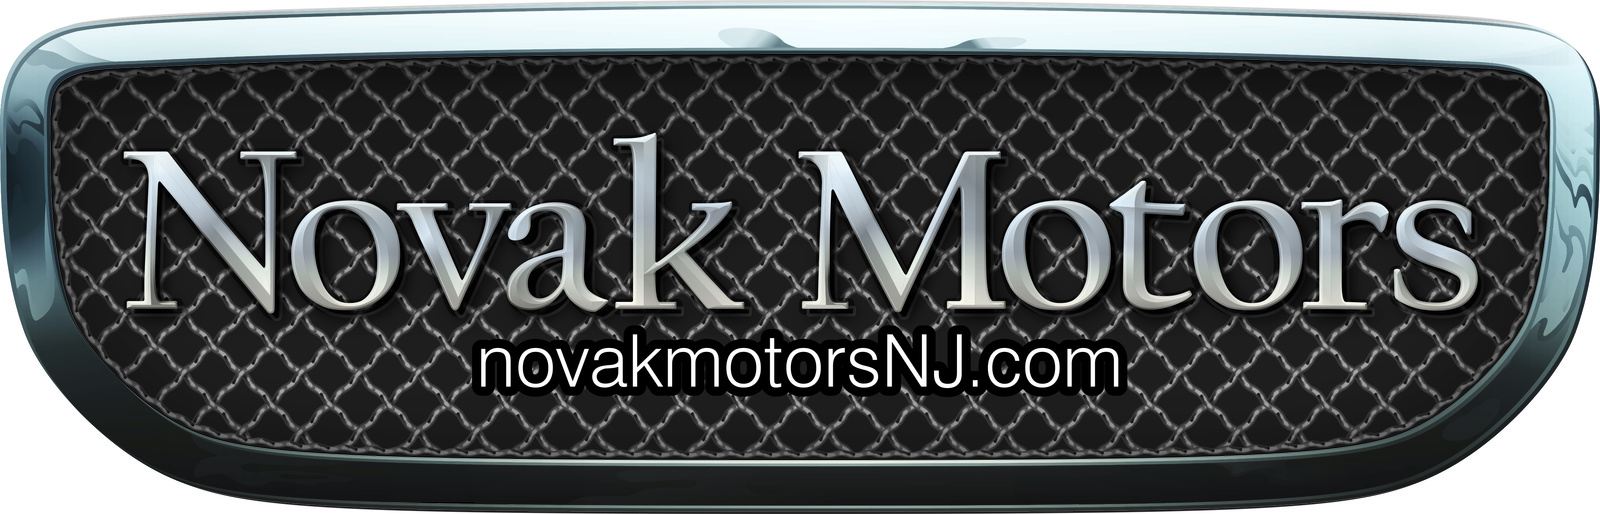 Novak Motors Nj >> Novak Motors - Lebanon, NJ: Read Consumer reviews, Browse